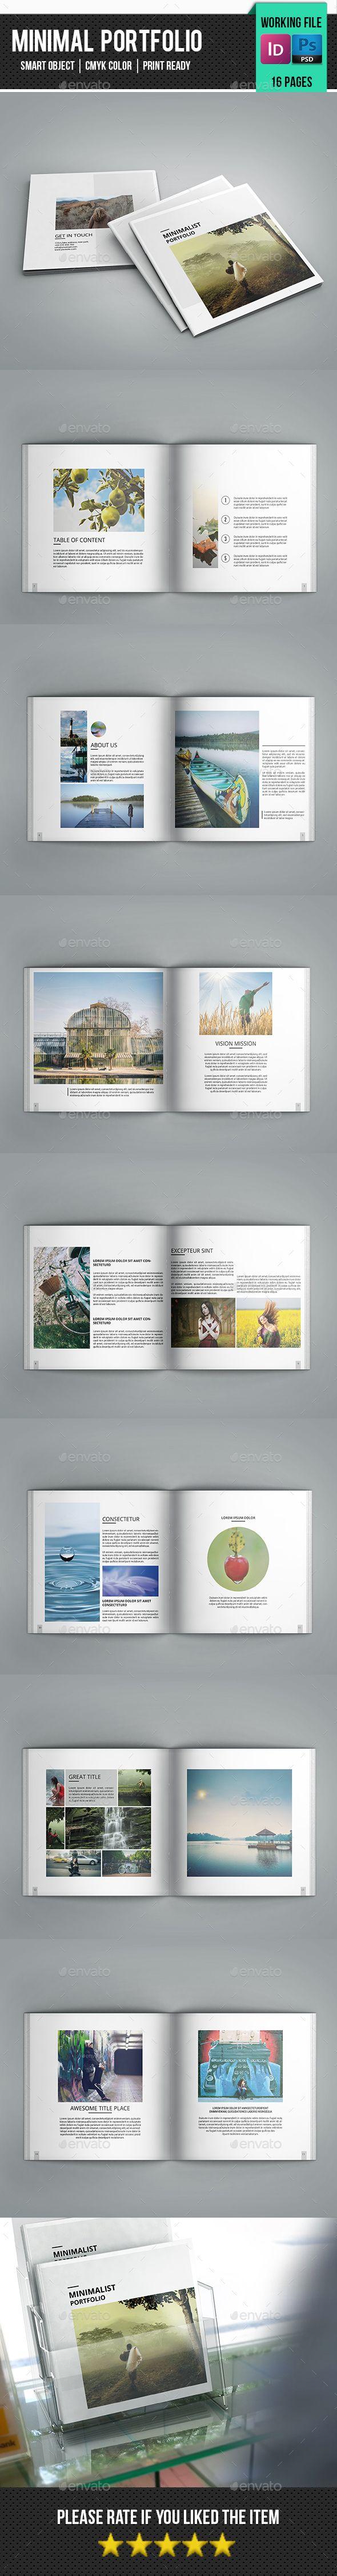 Square Portfolio Template-V84  #elegant #blue #brochure • Click here to download ! http://graphicriver.net/item/square-portfolio-templatev84/16209203?ref=pxcr